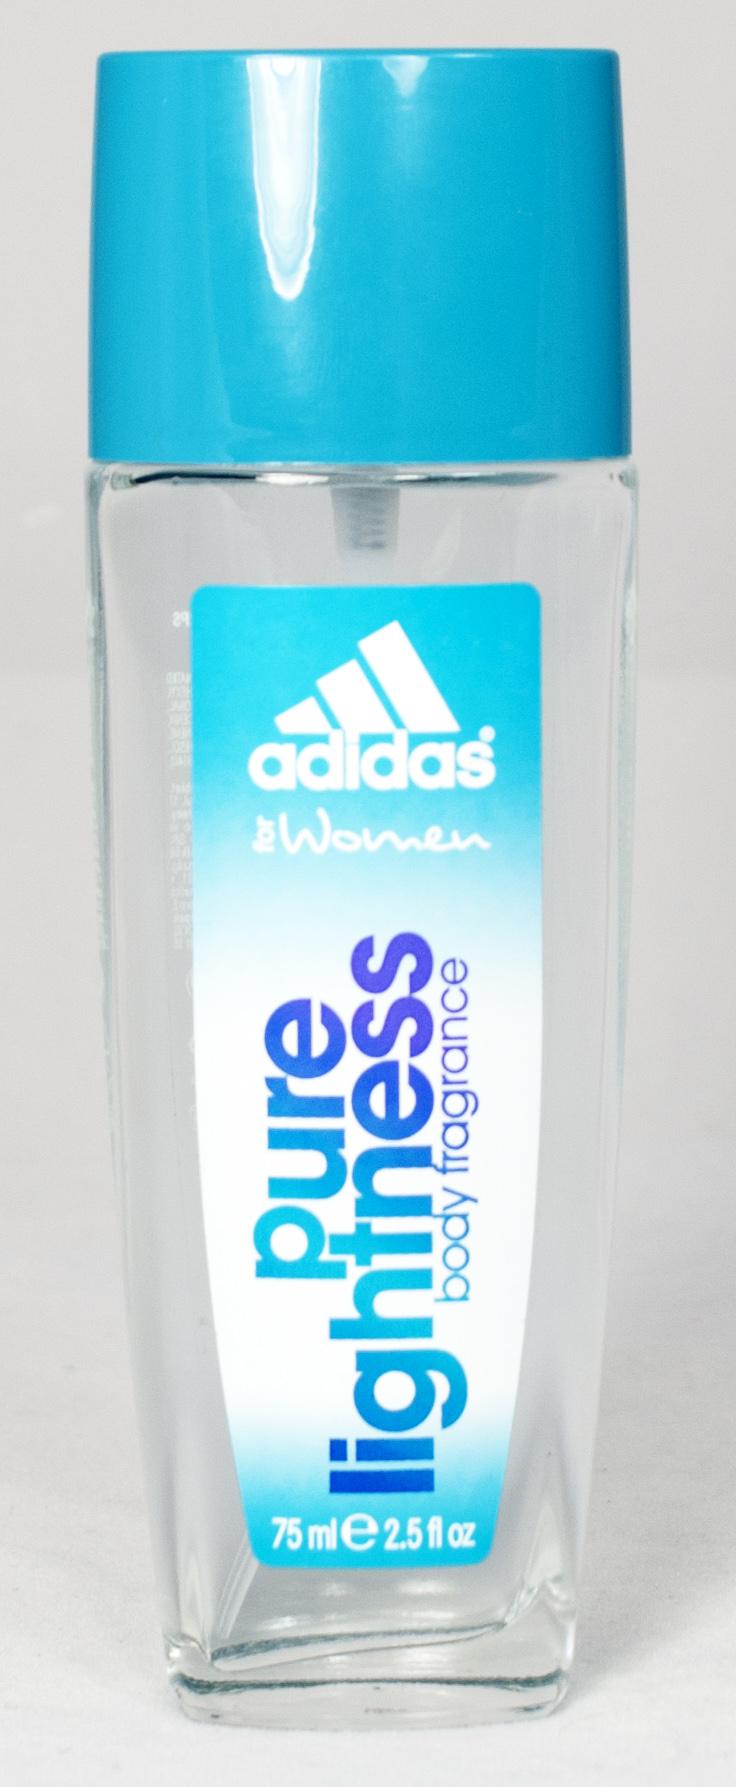 Image of Adidas Pure Lightness Body Fragrance for Women 75ml